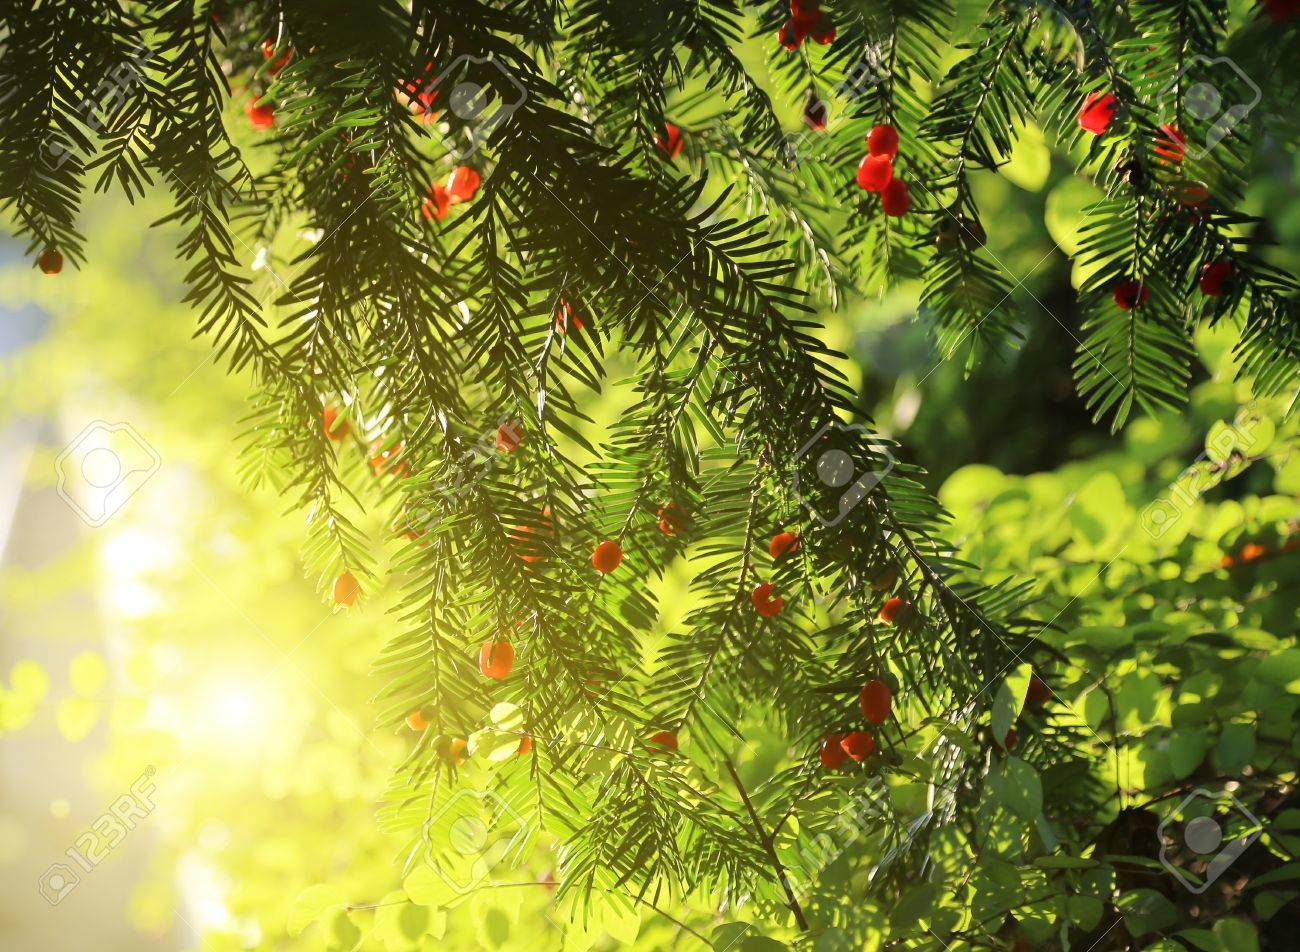 red berries growing on evergreen yew tree in sunlight european